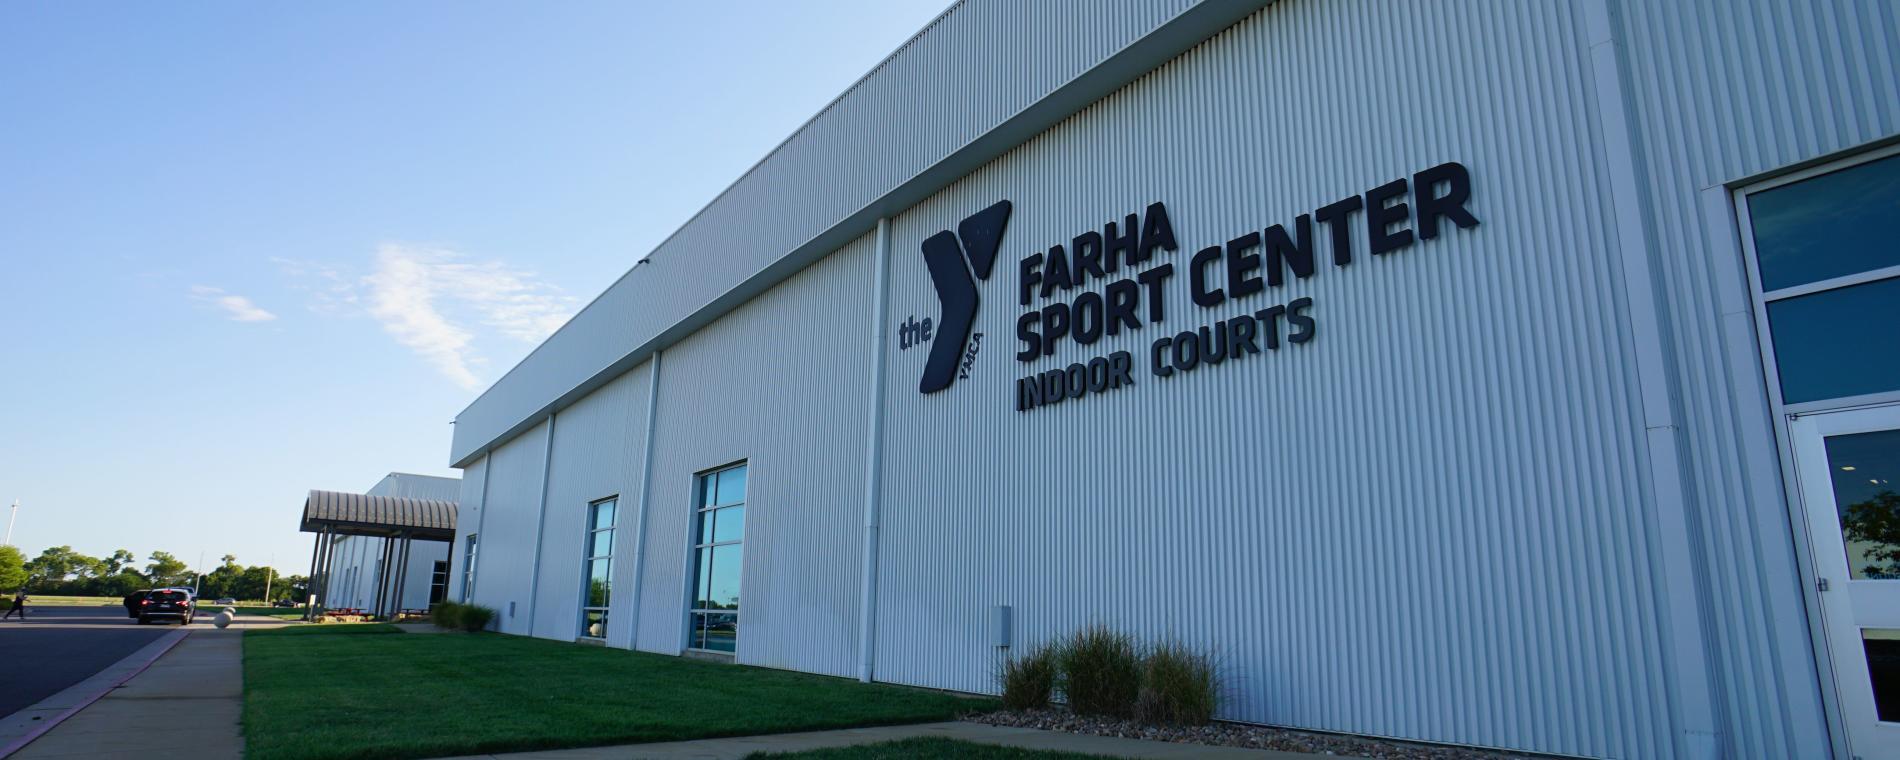 Farha South Courts South YMCA